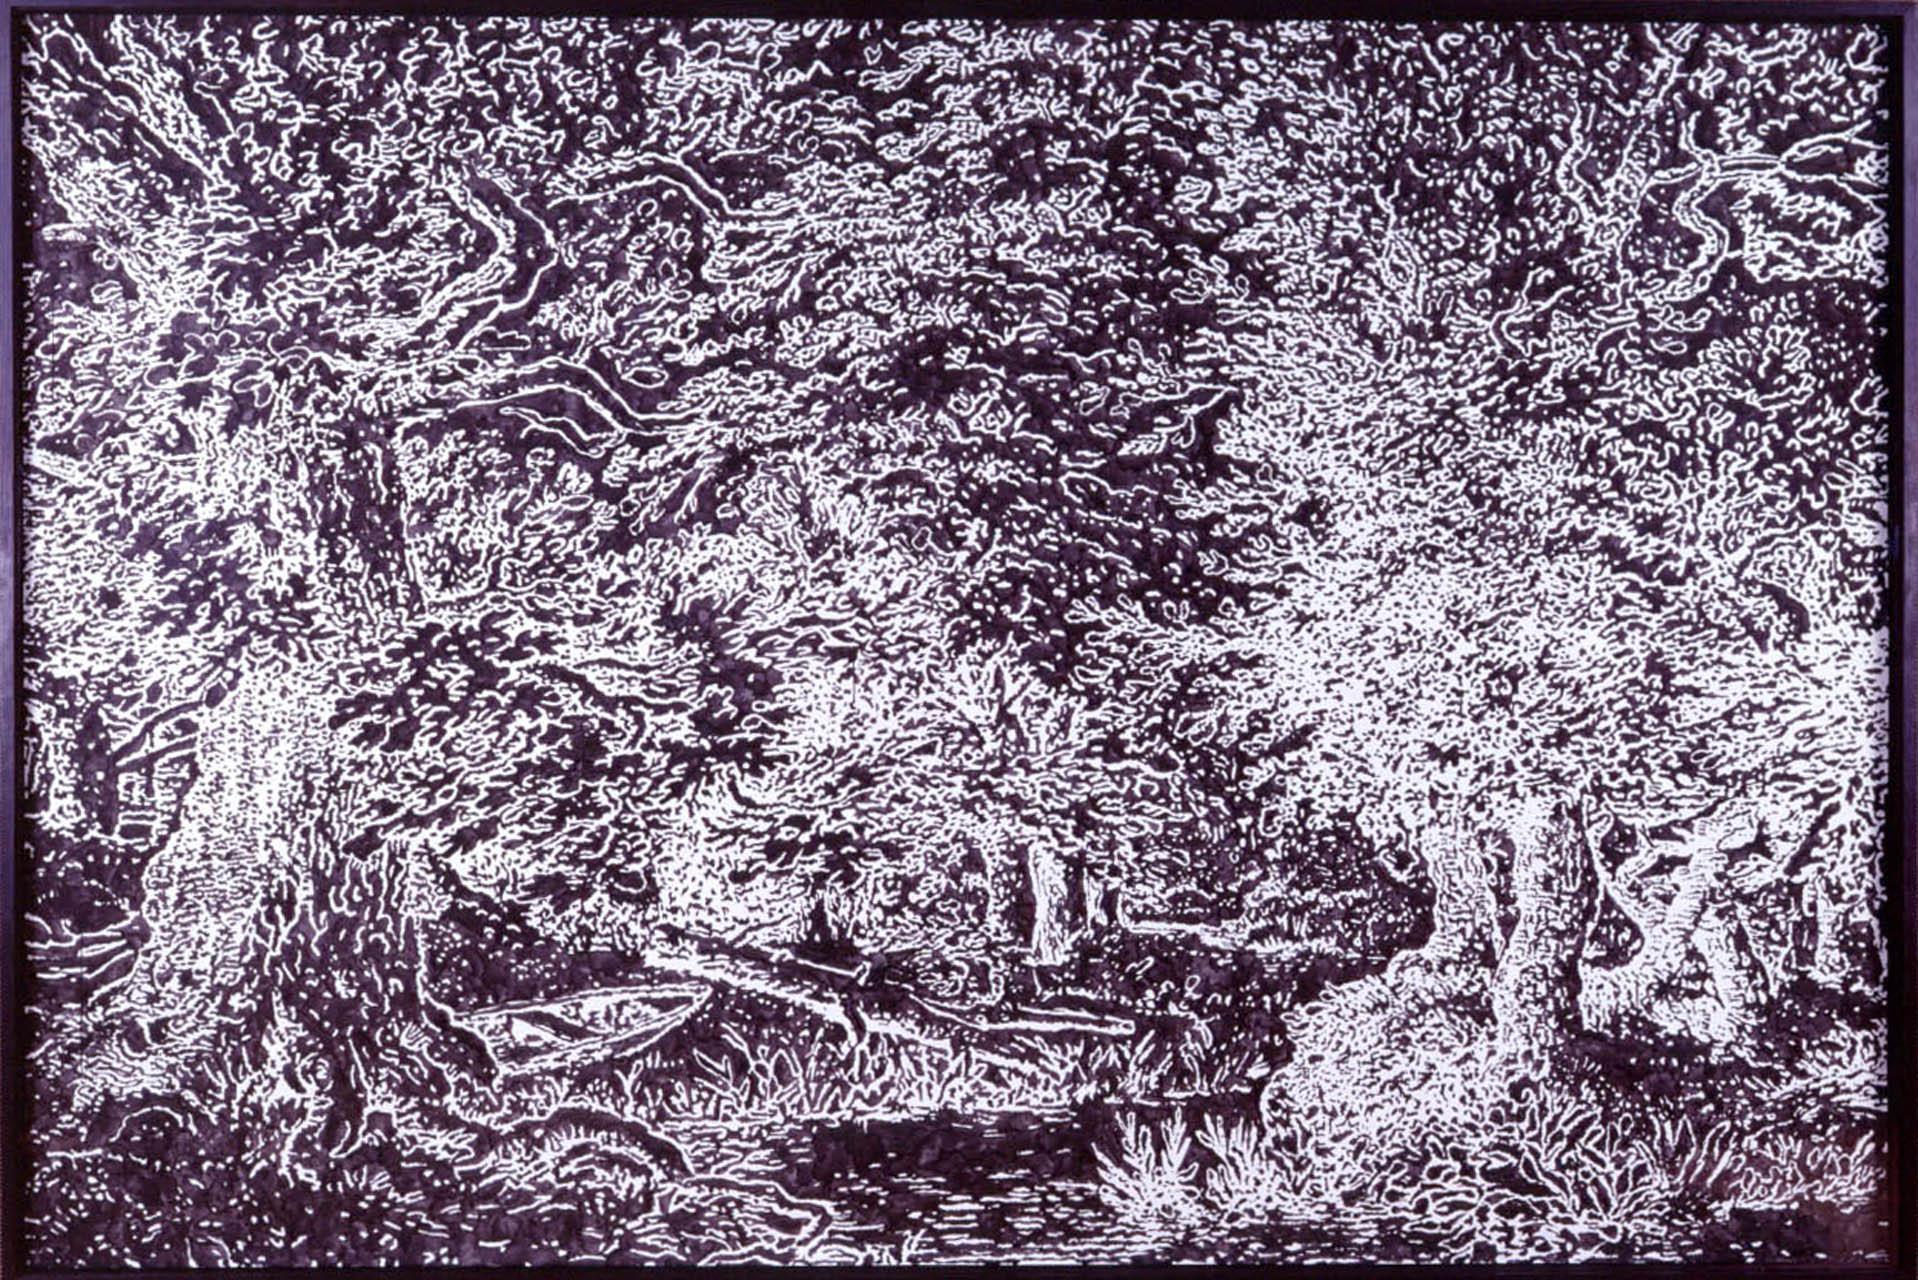 "<div class=""artwork_caption""><p>FUENFZEHNTERAUGUSTZWEITAUSENDUNDZWEI, 2002</p></div>"